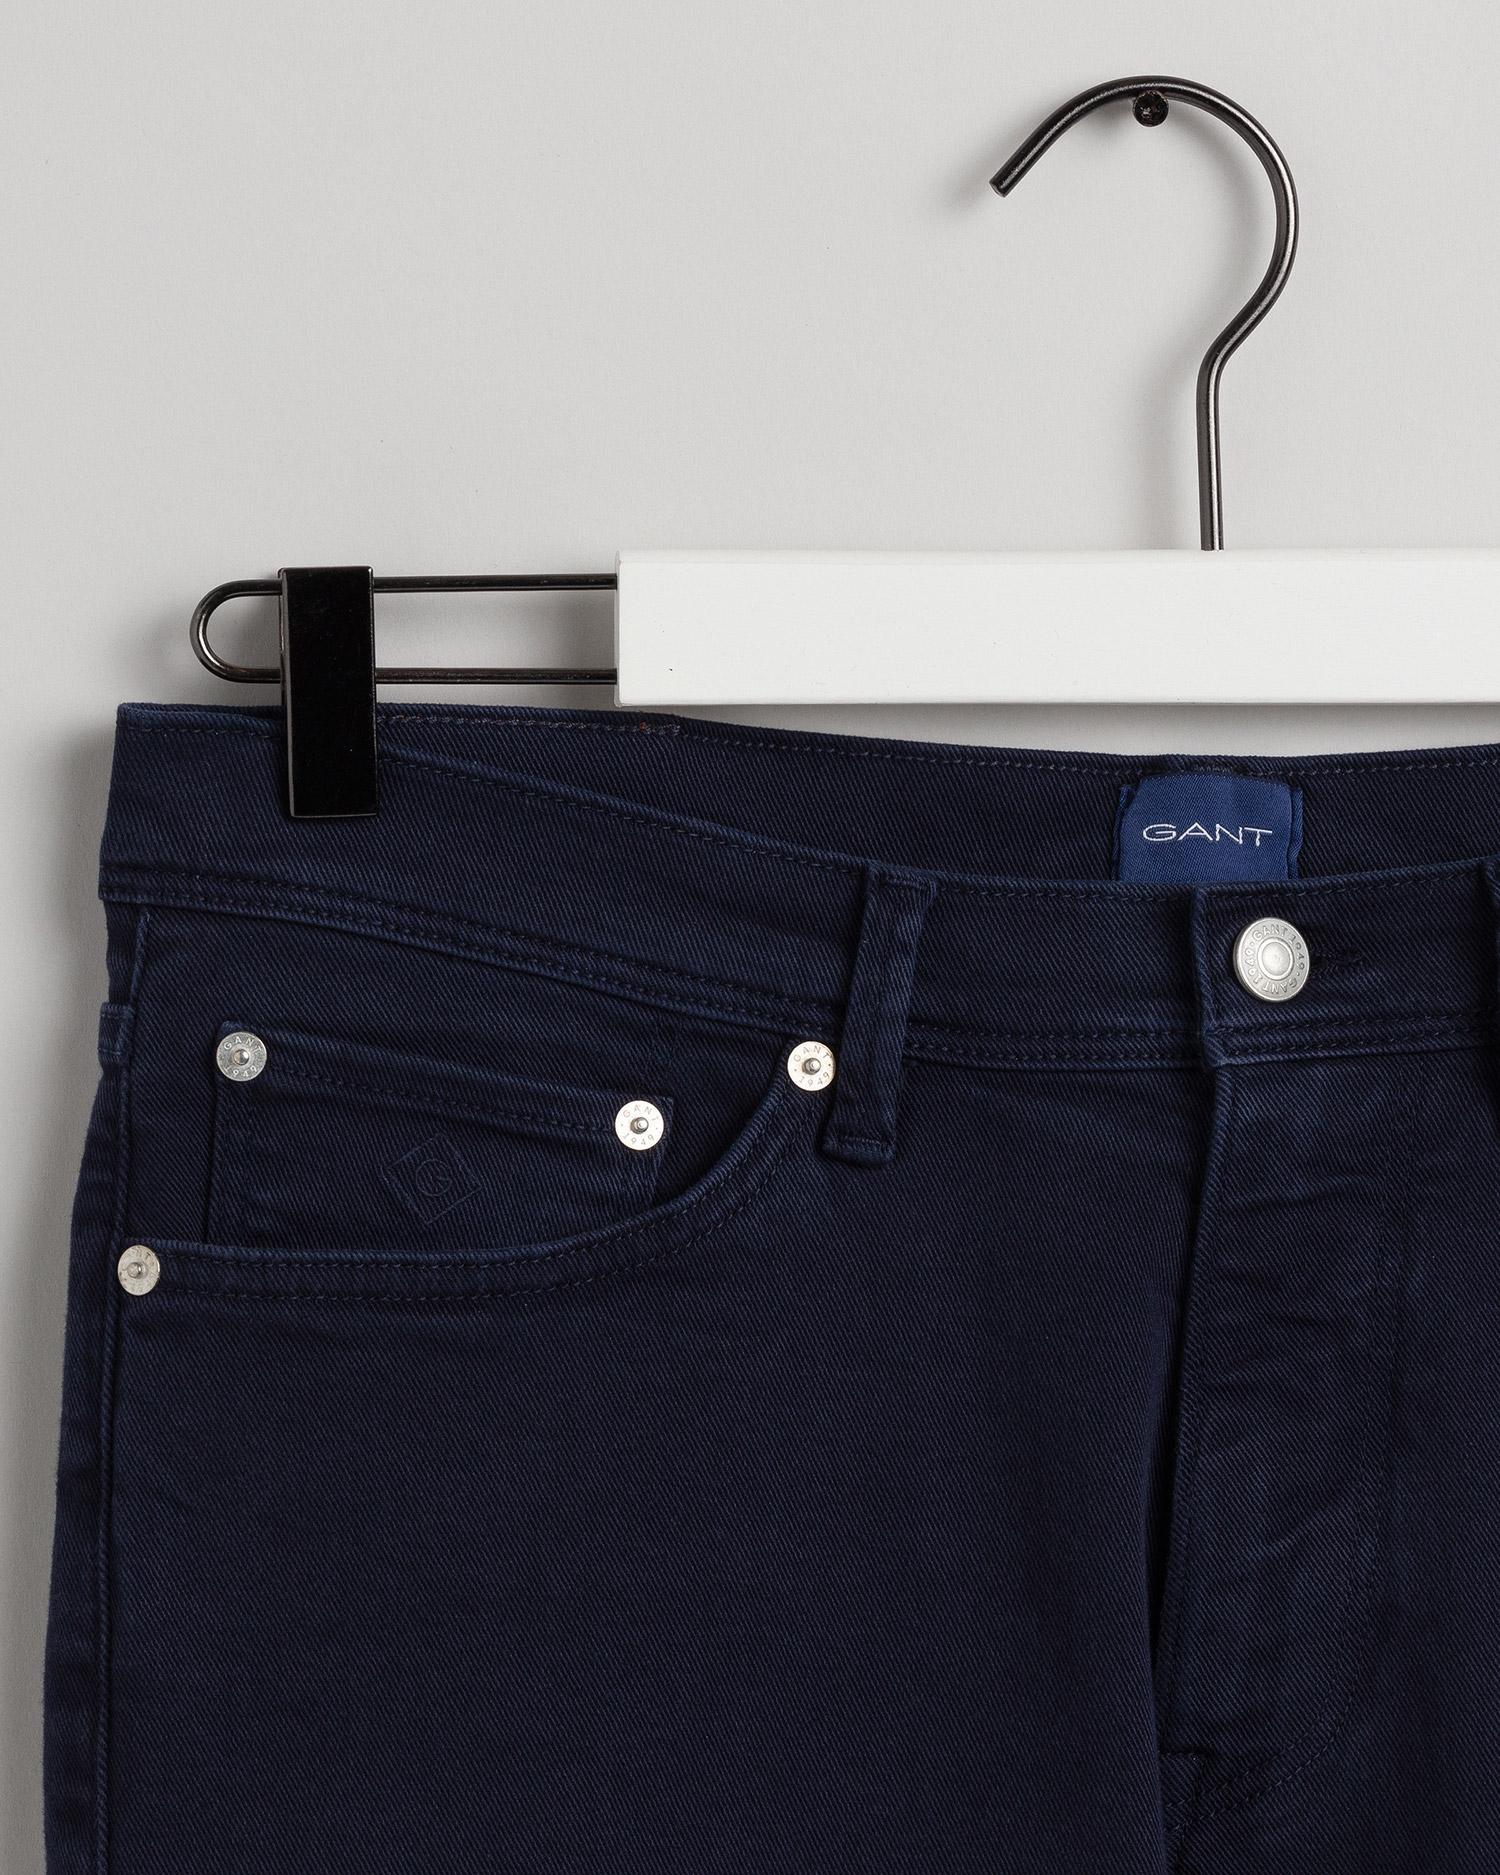 GANT kolorowe męskie dżinsy Maxen Extra Slim Fit Active-Recover - 1000180